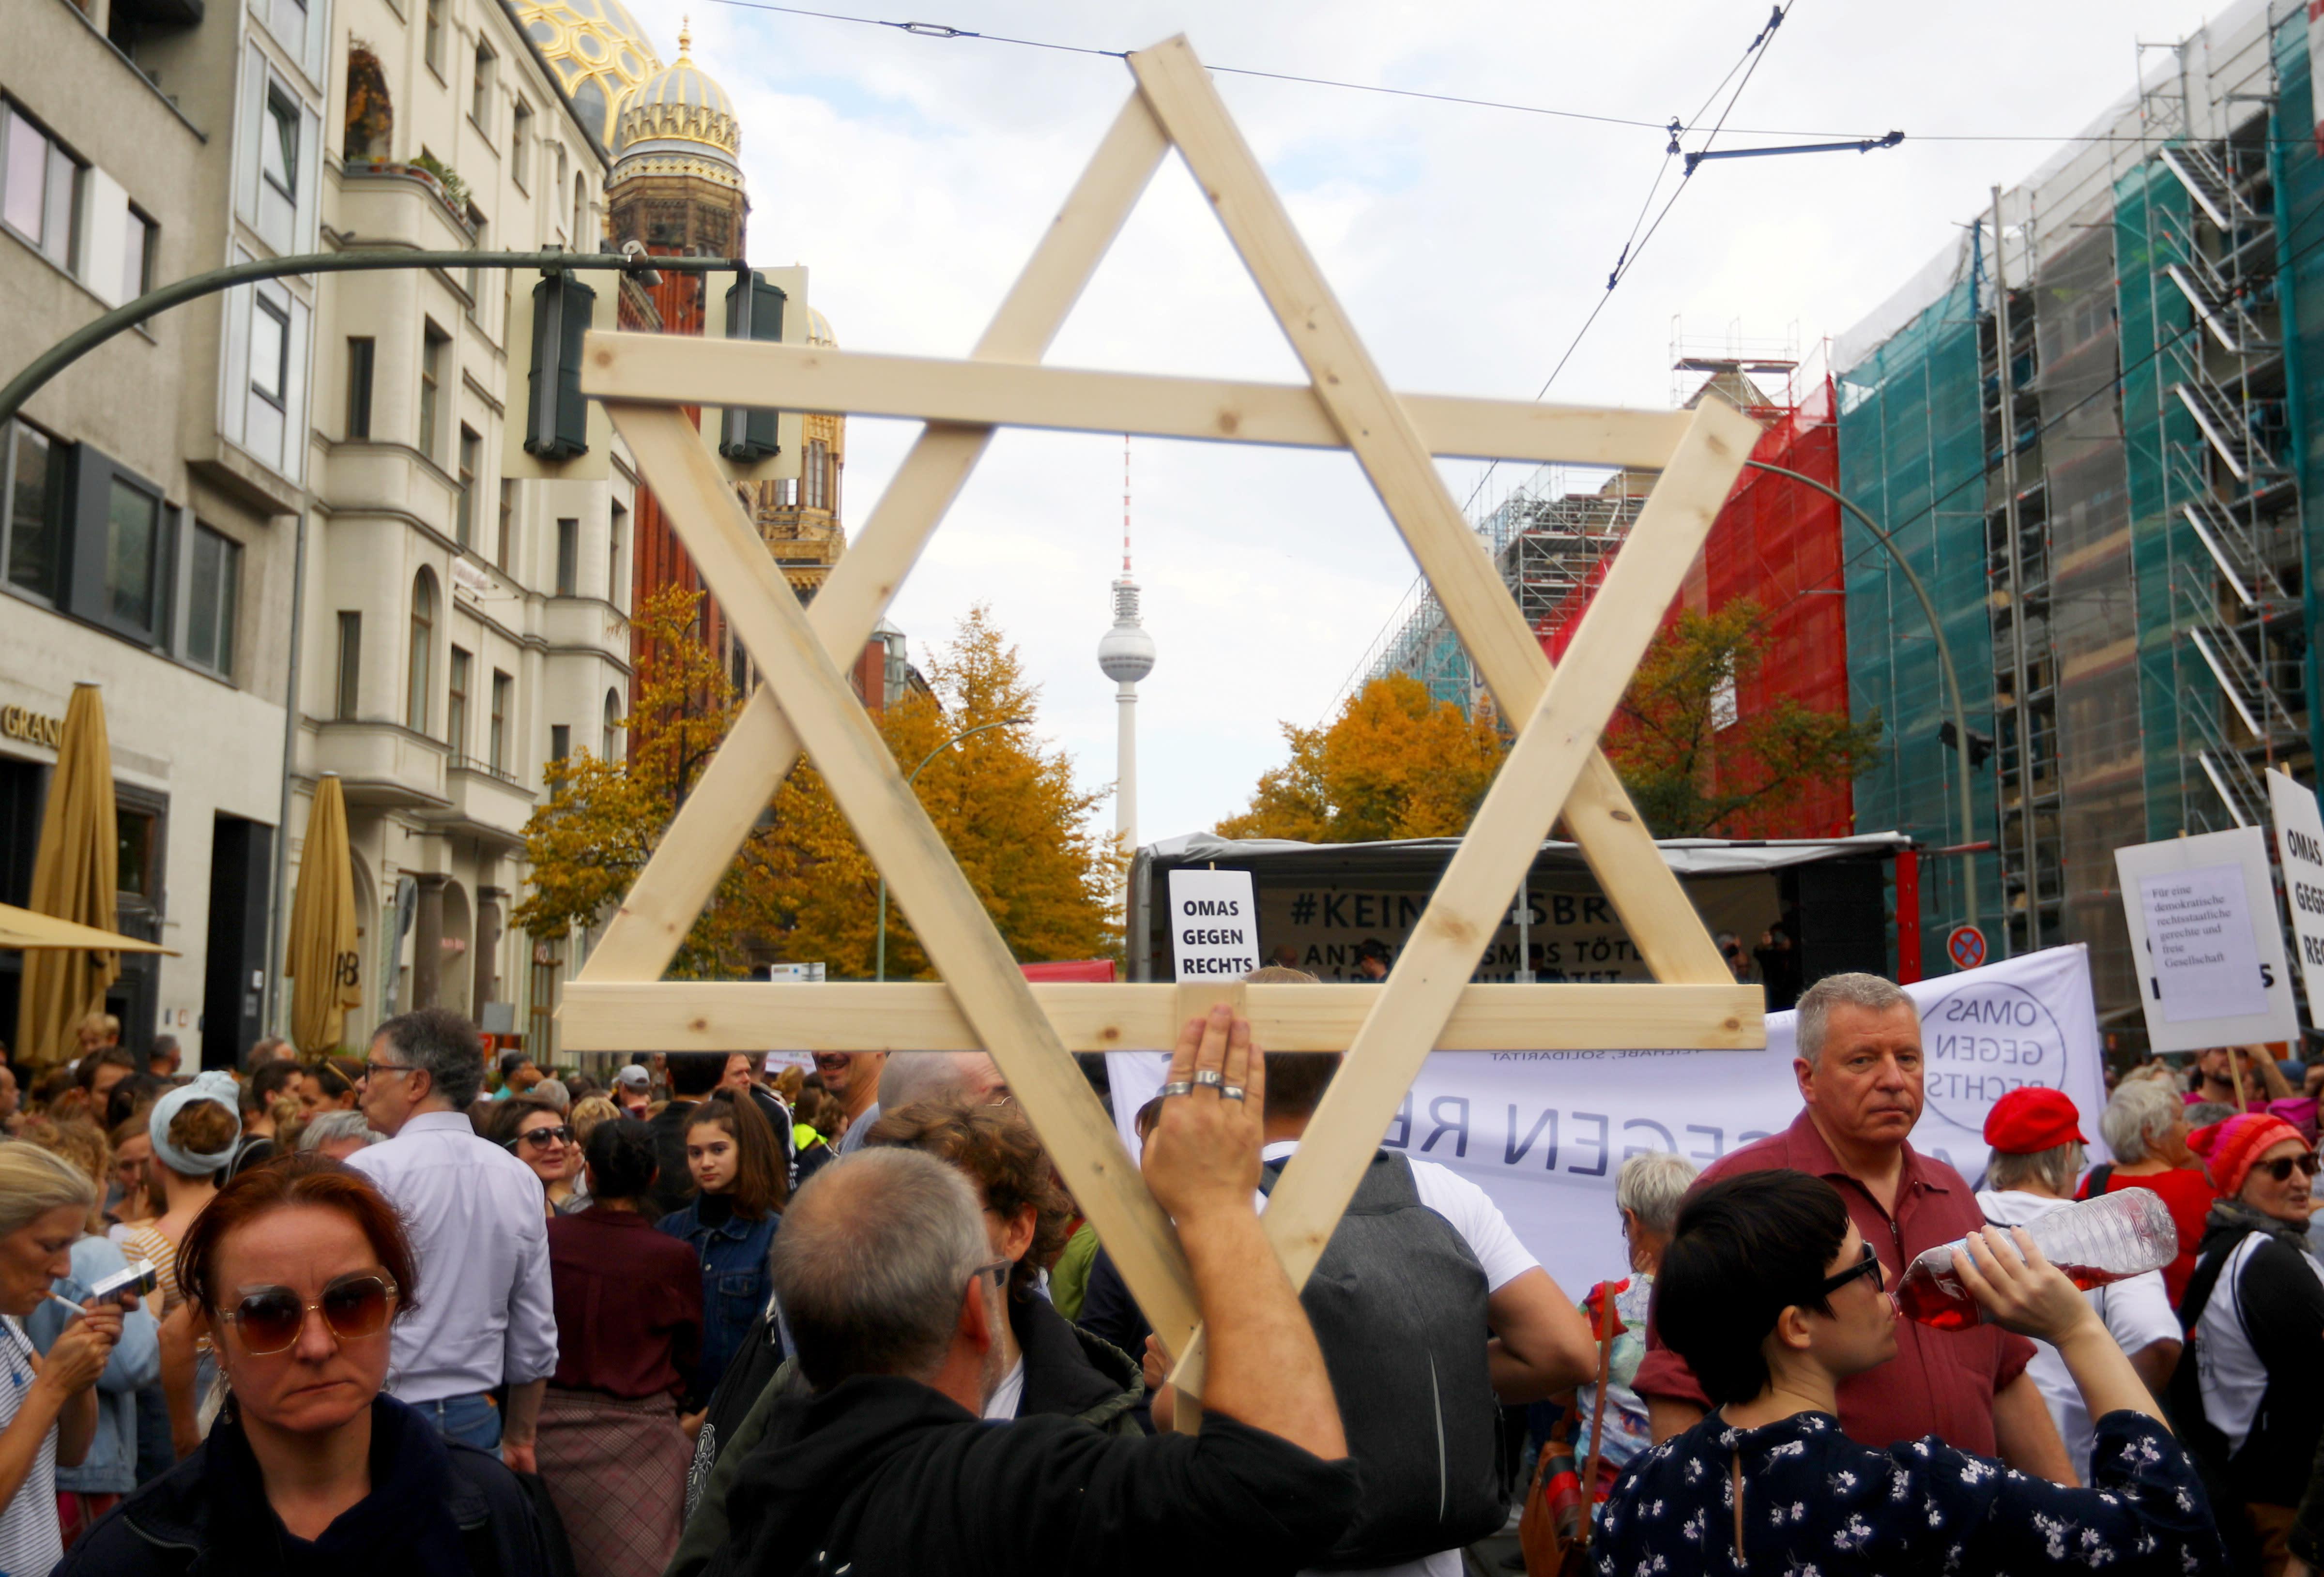 Germany plans year-long Jewish culture celebration amid 'explosion of anti-Semitism'